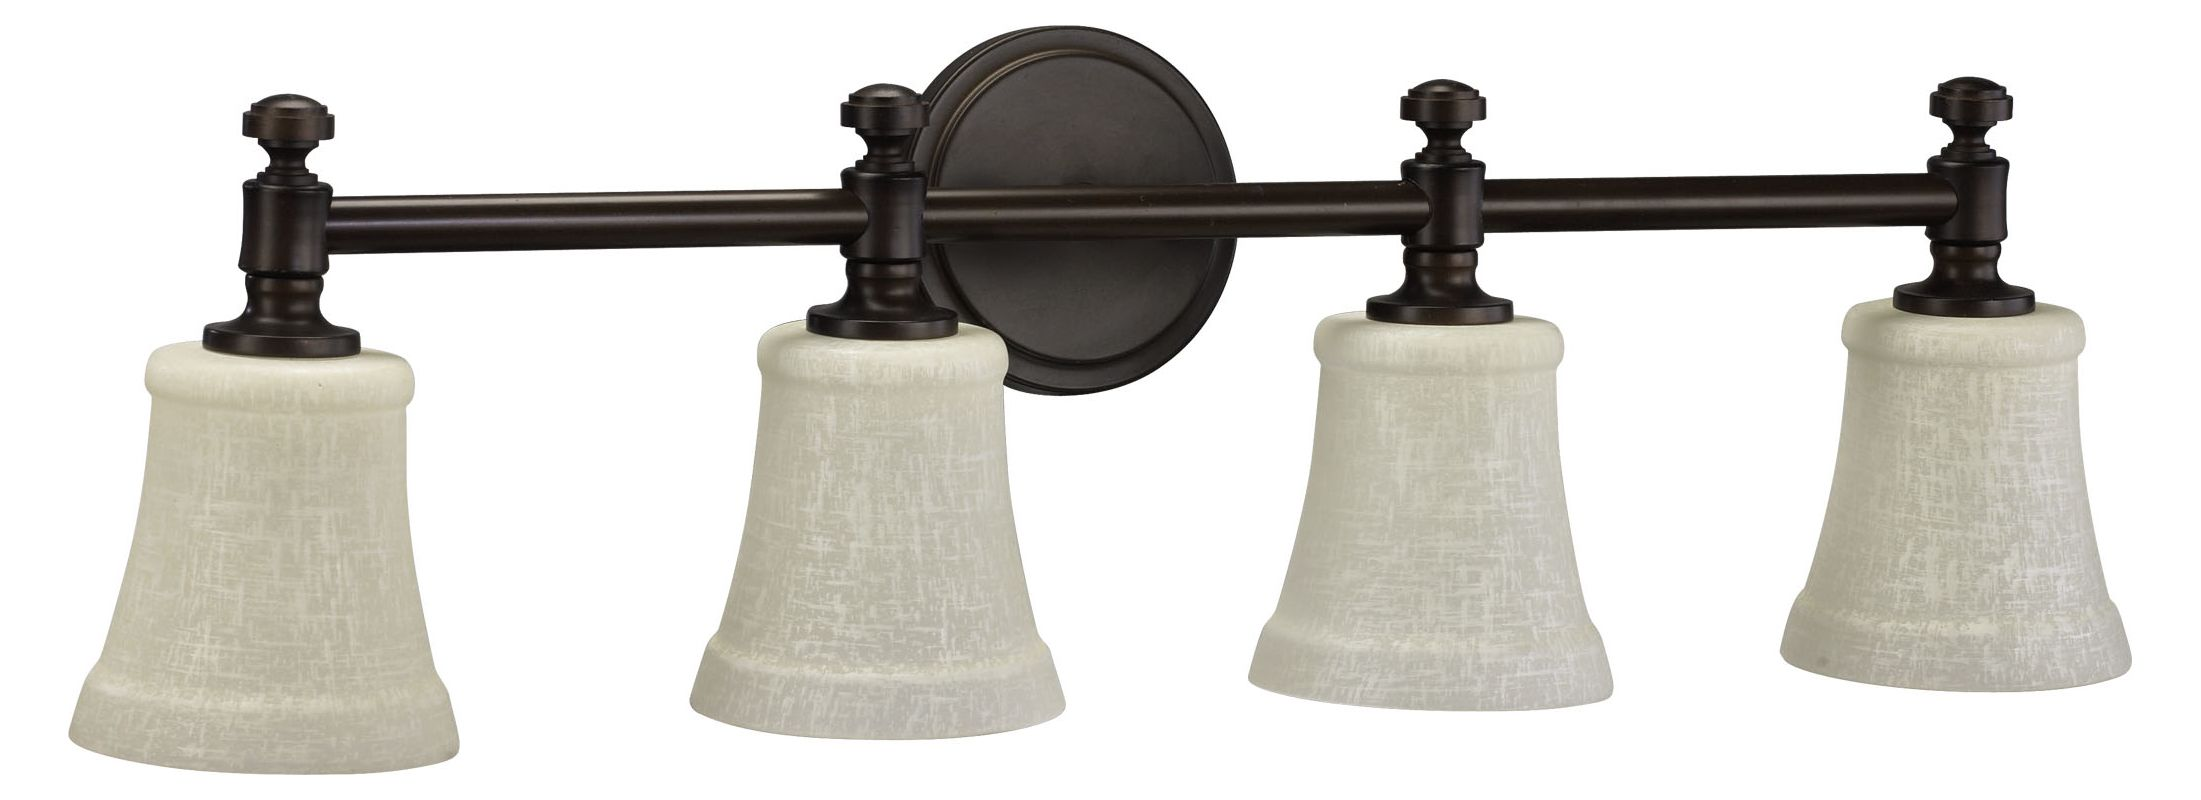 Quorum International 5122-4 4 Light Down Lighting Vanity Light from Sale $159.00 ITEM: bci729782 ID#:5122-4-86 :